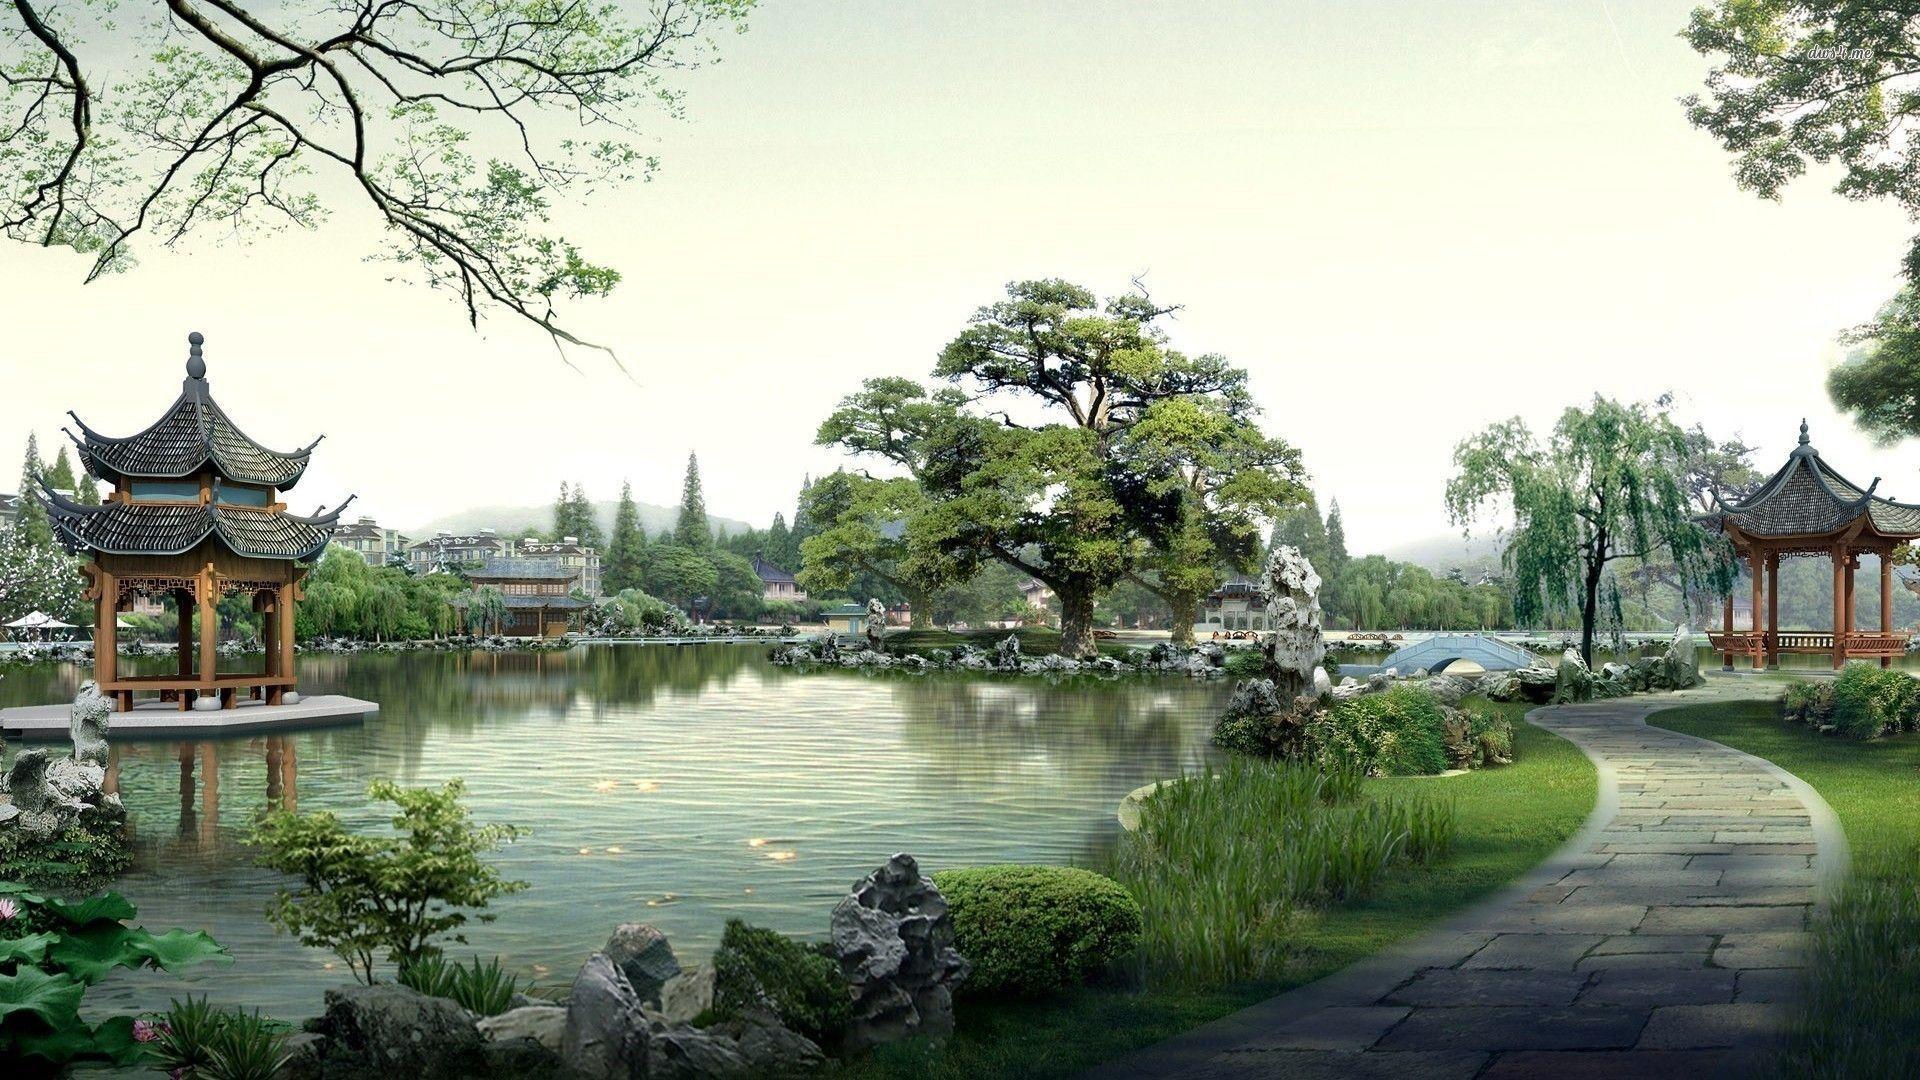 kyoto art wallpaper